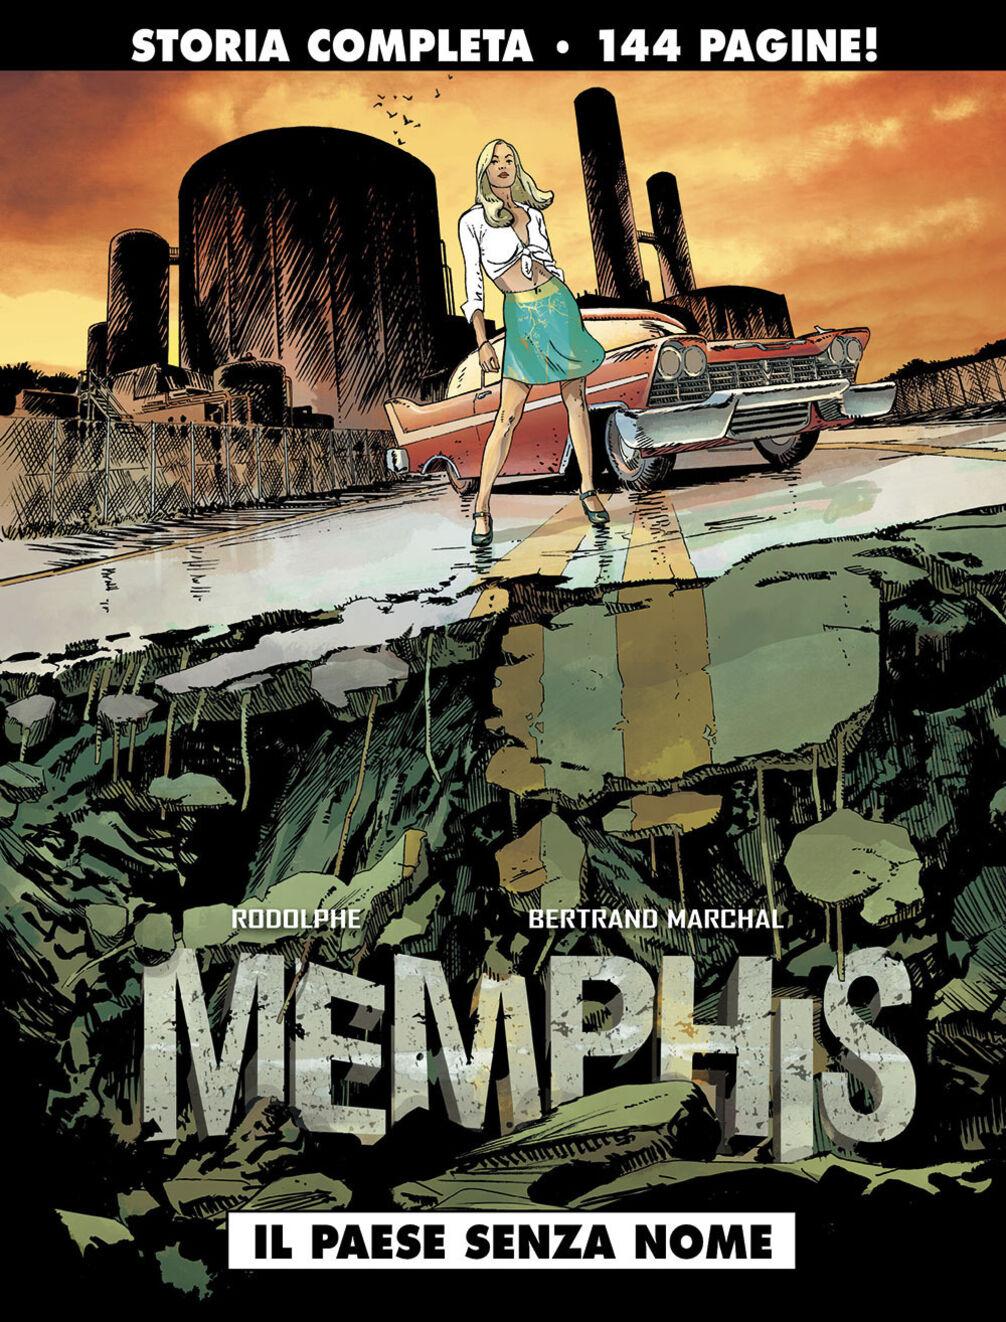 Il paese senza nome. Memphis